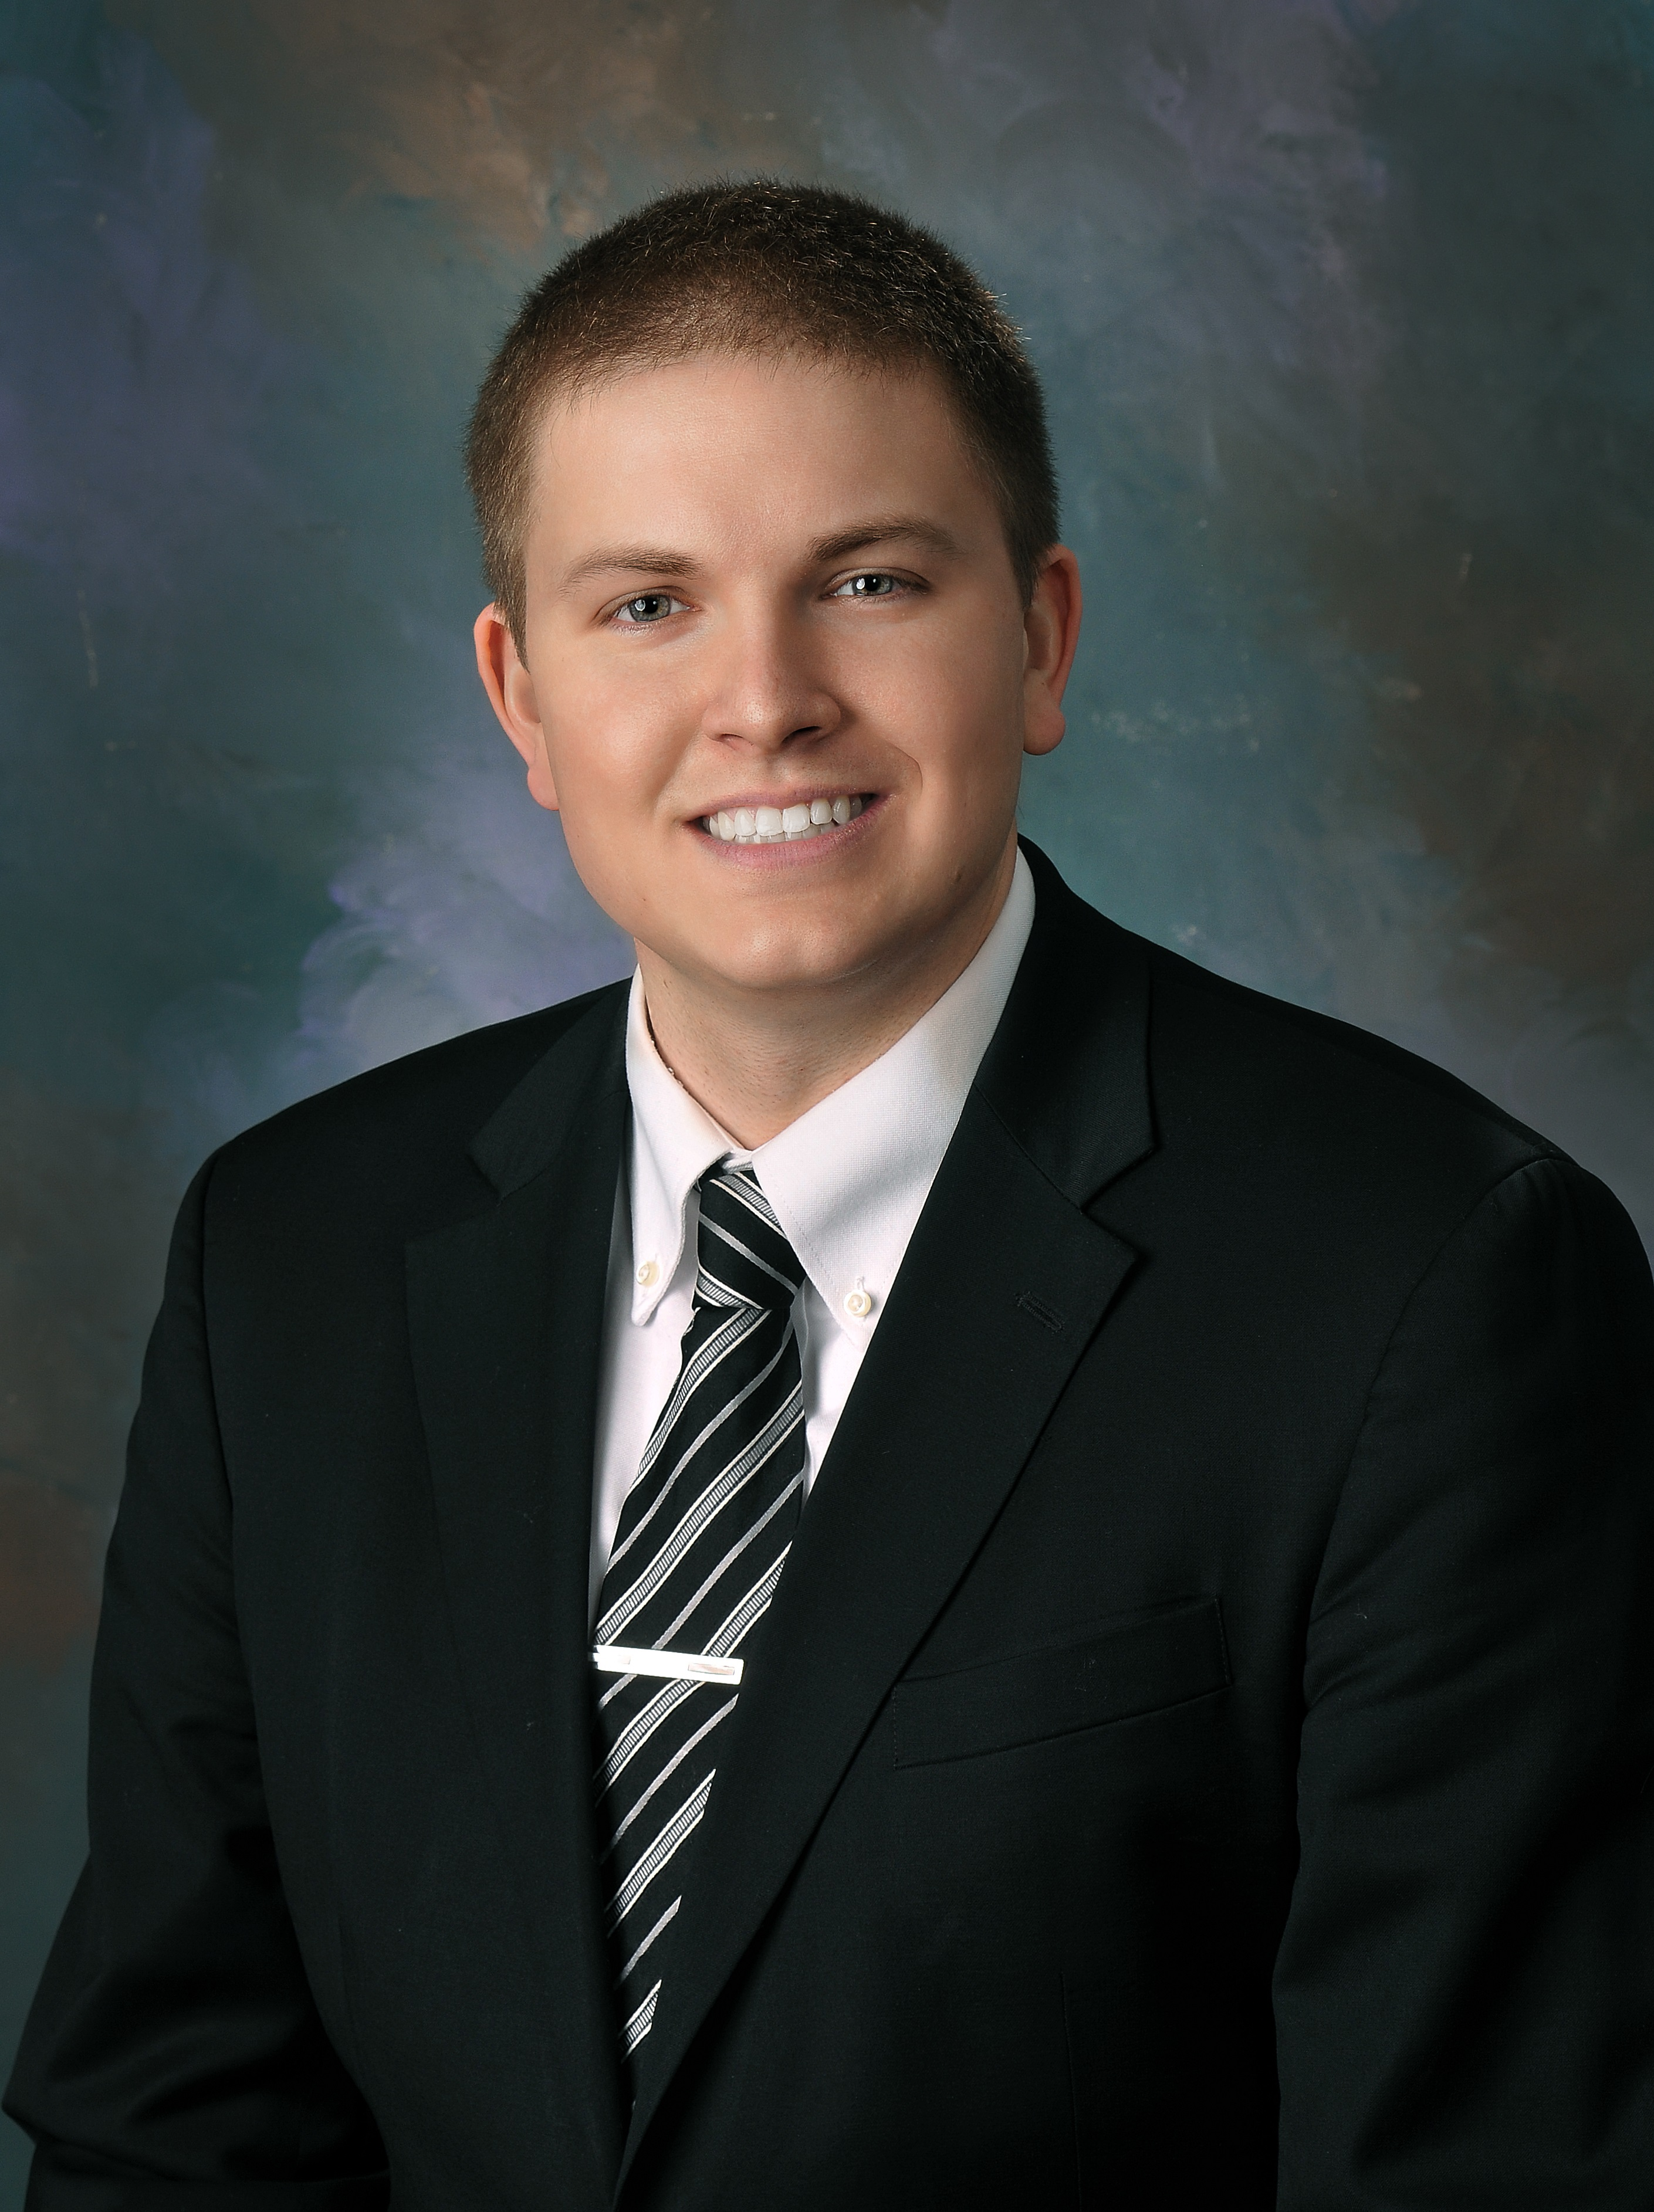 Daniel J. Burns